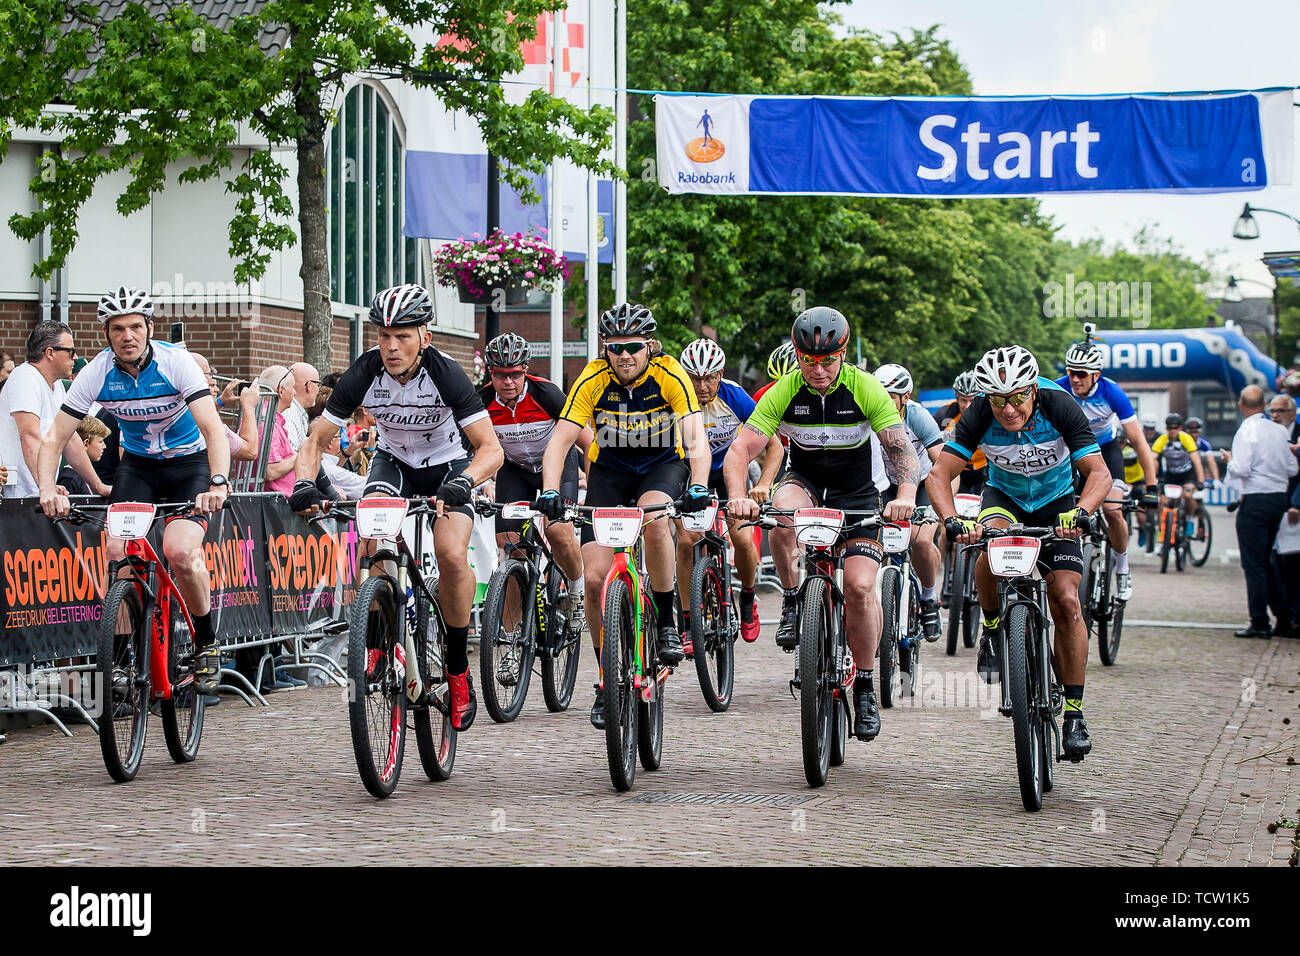 GOIRLE - Streetrace Goirle 10-06-2019. Oranjeplein. Buitensport, Wielrennen. Huub Kools ex professionals, during Streetrace Gorile. Credit: Pro Shots/Alamy Live News - Stock Image